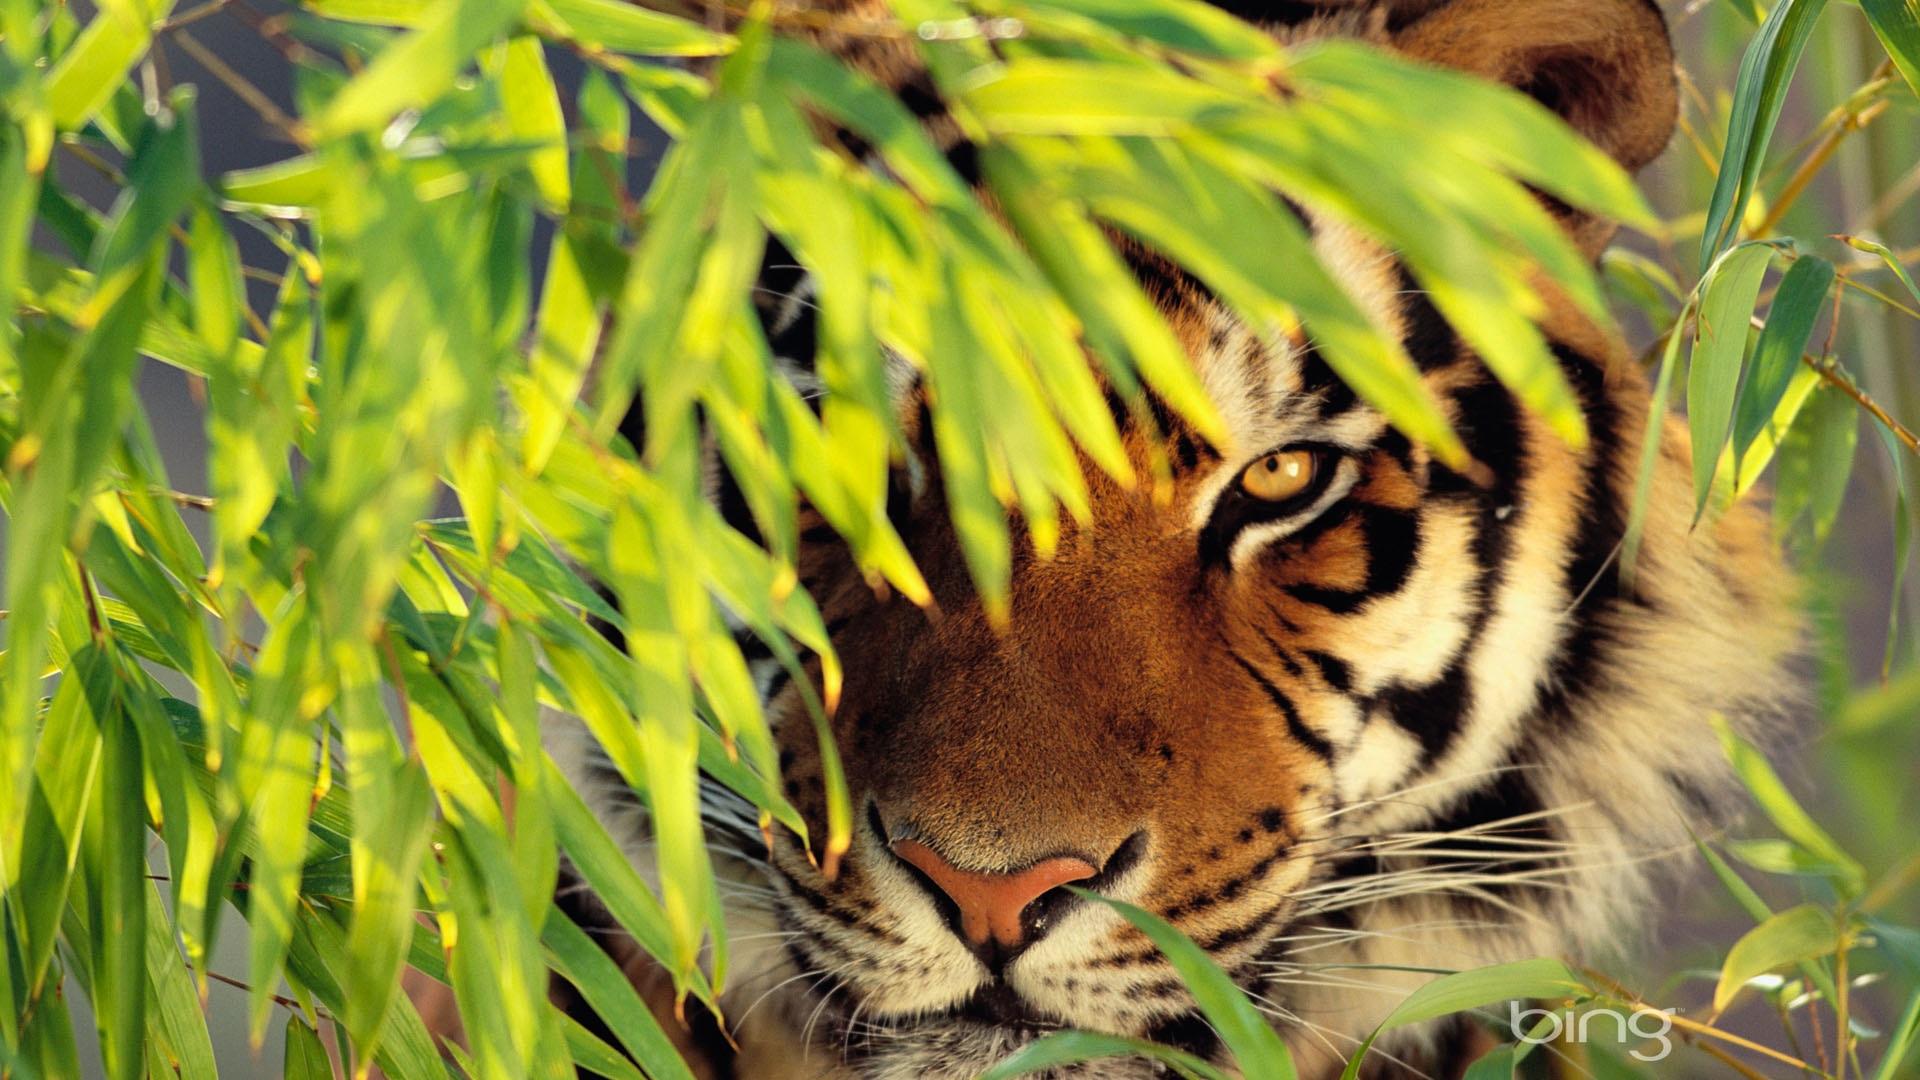 tiger hd wallpaper 1920x1080